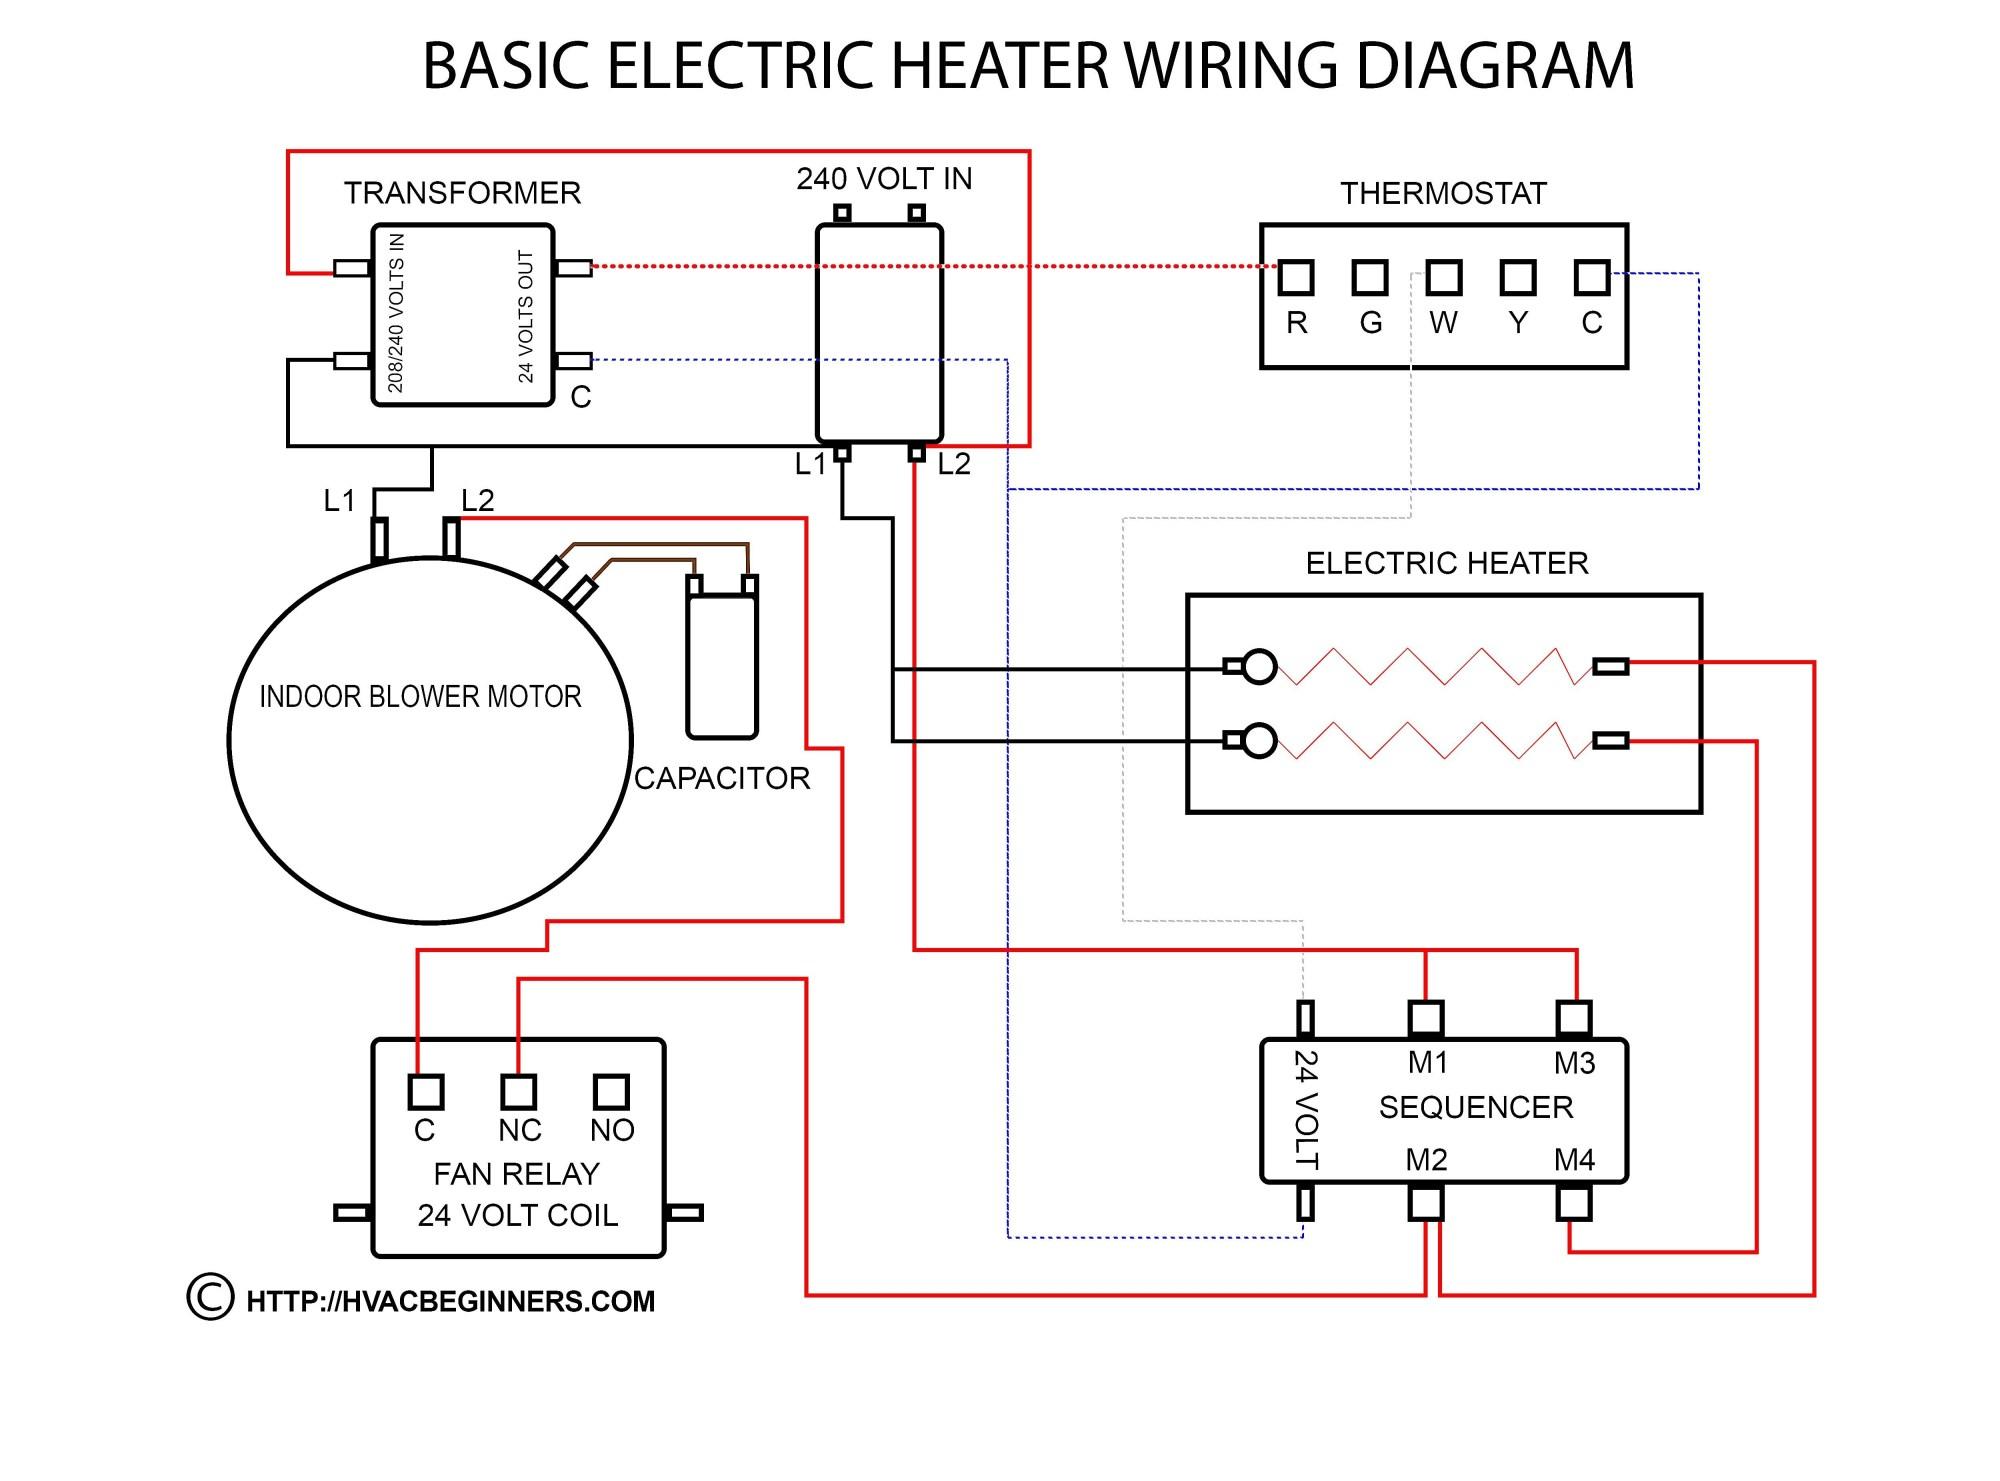 hight resolution of wiring diagram for beckett oil burner wiring diagram operations beckett burner wiring diagram beckett burner diagram